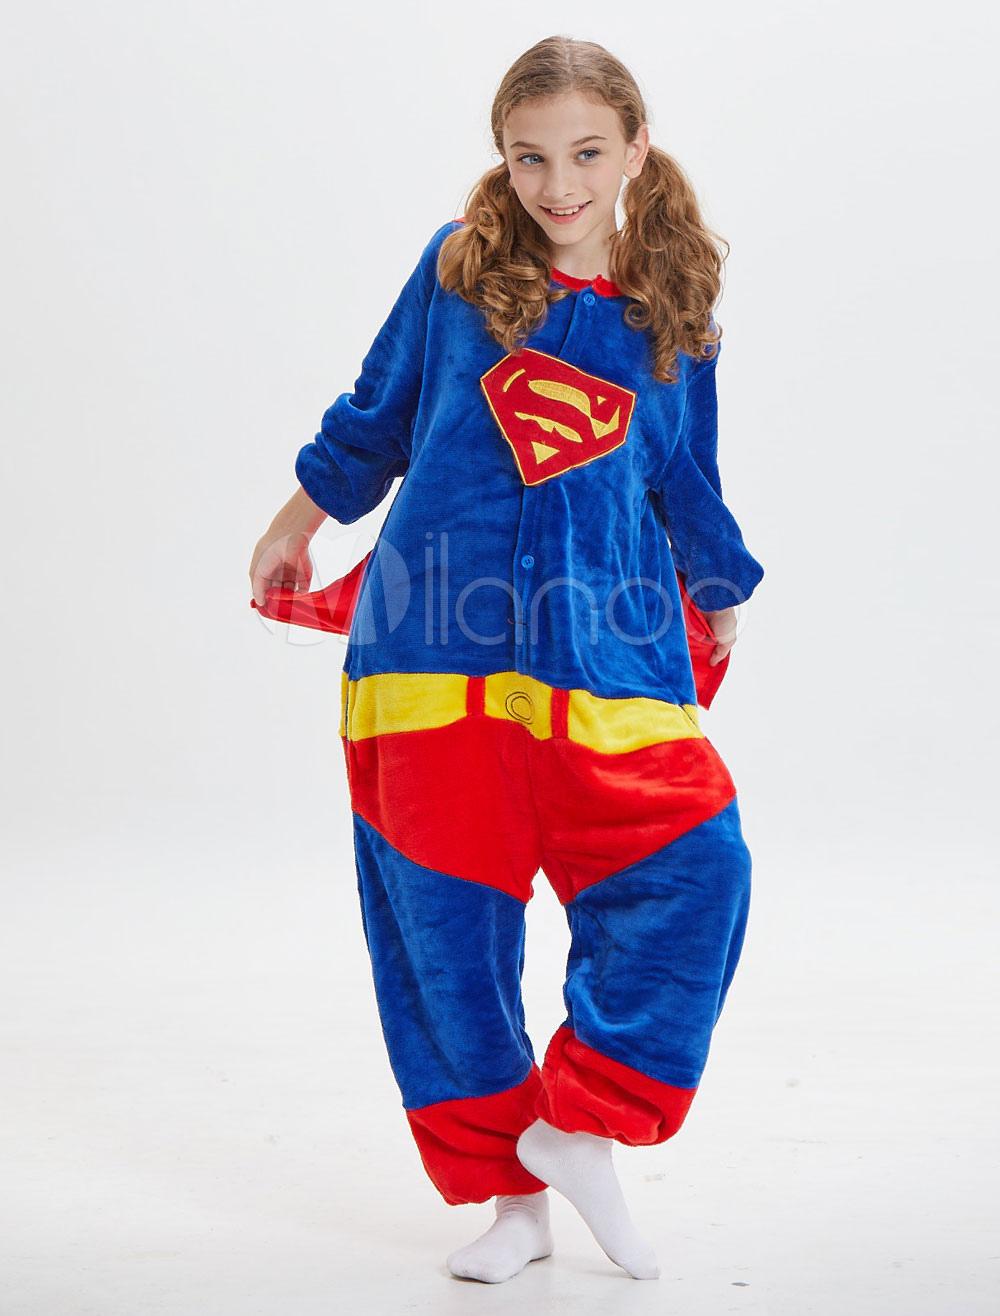 9d00f3c2b1ba6 Kids Superman Kigurumi Onesie Pajamas Deep Blue Flannel Long ...